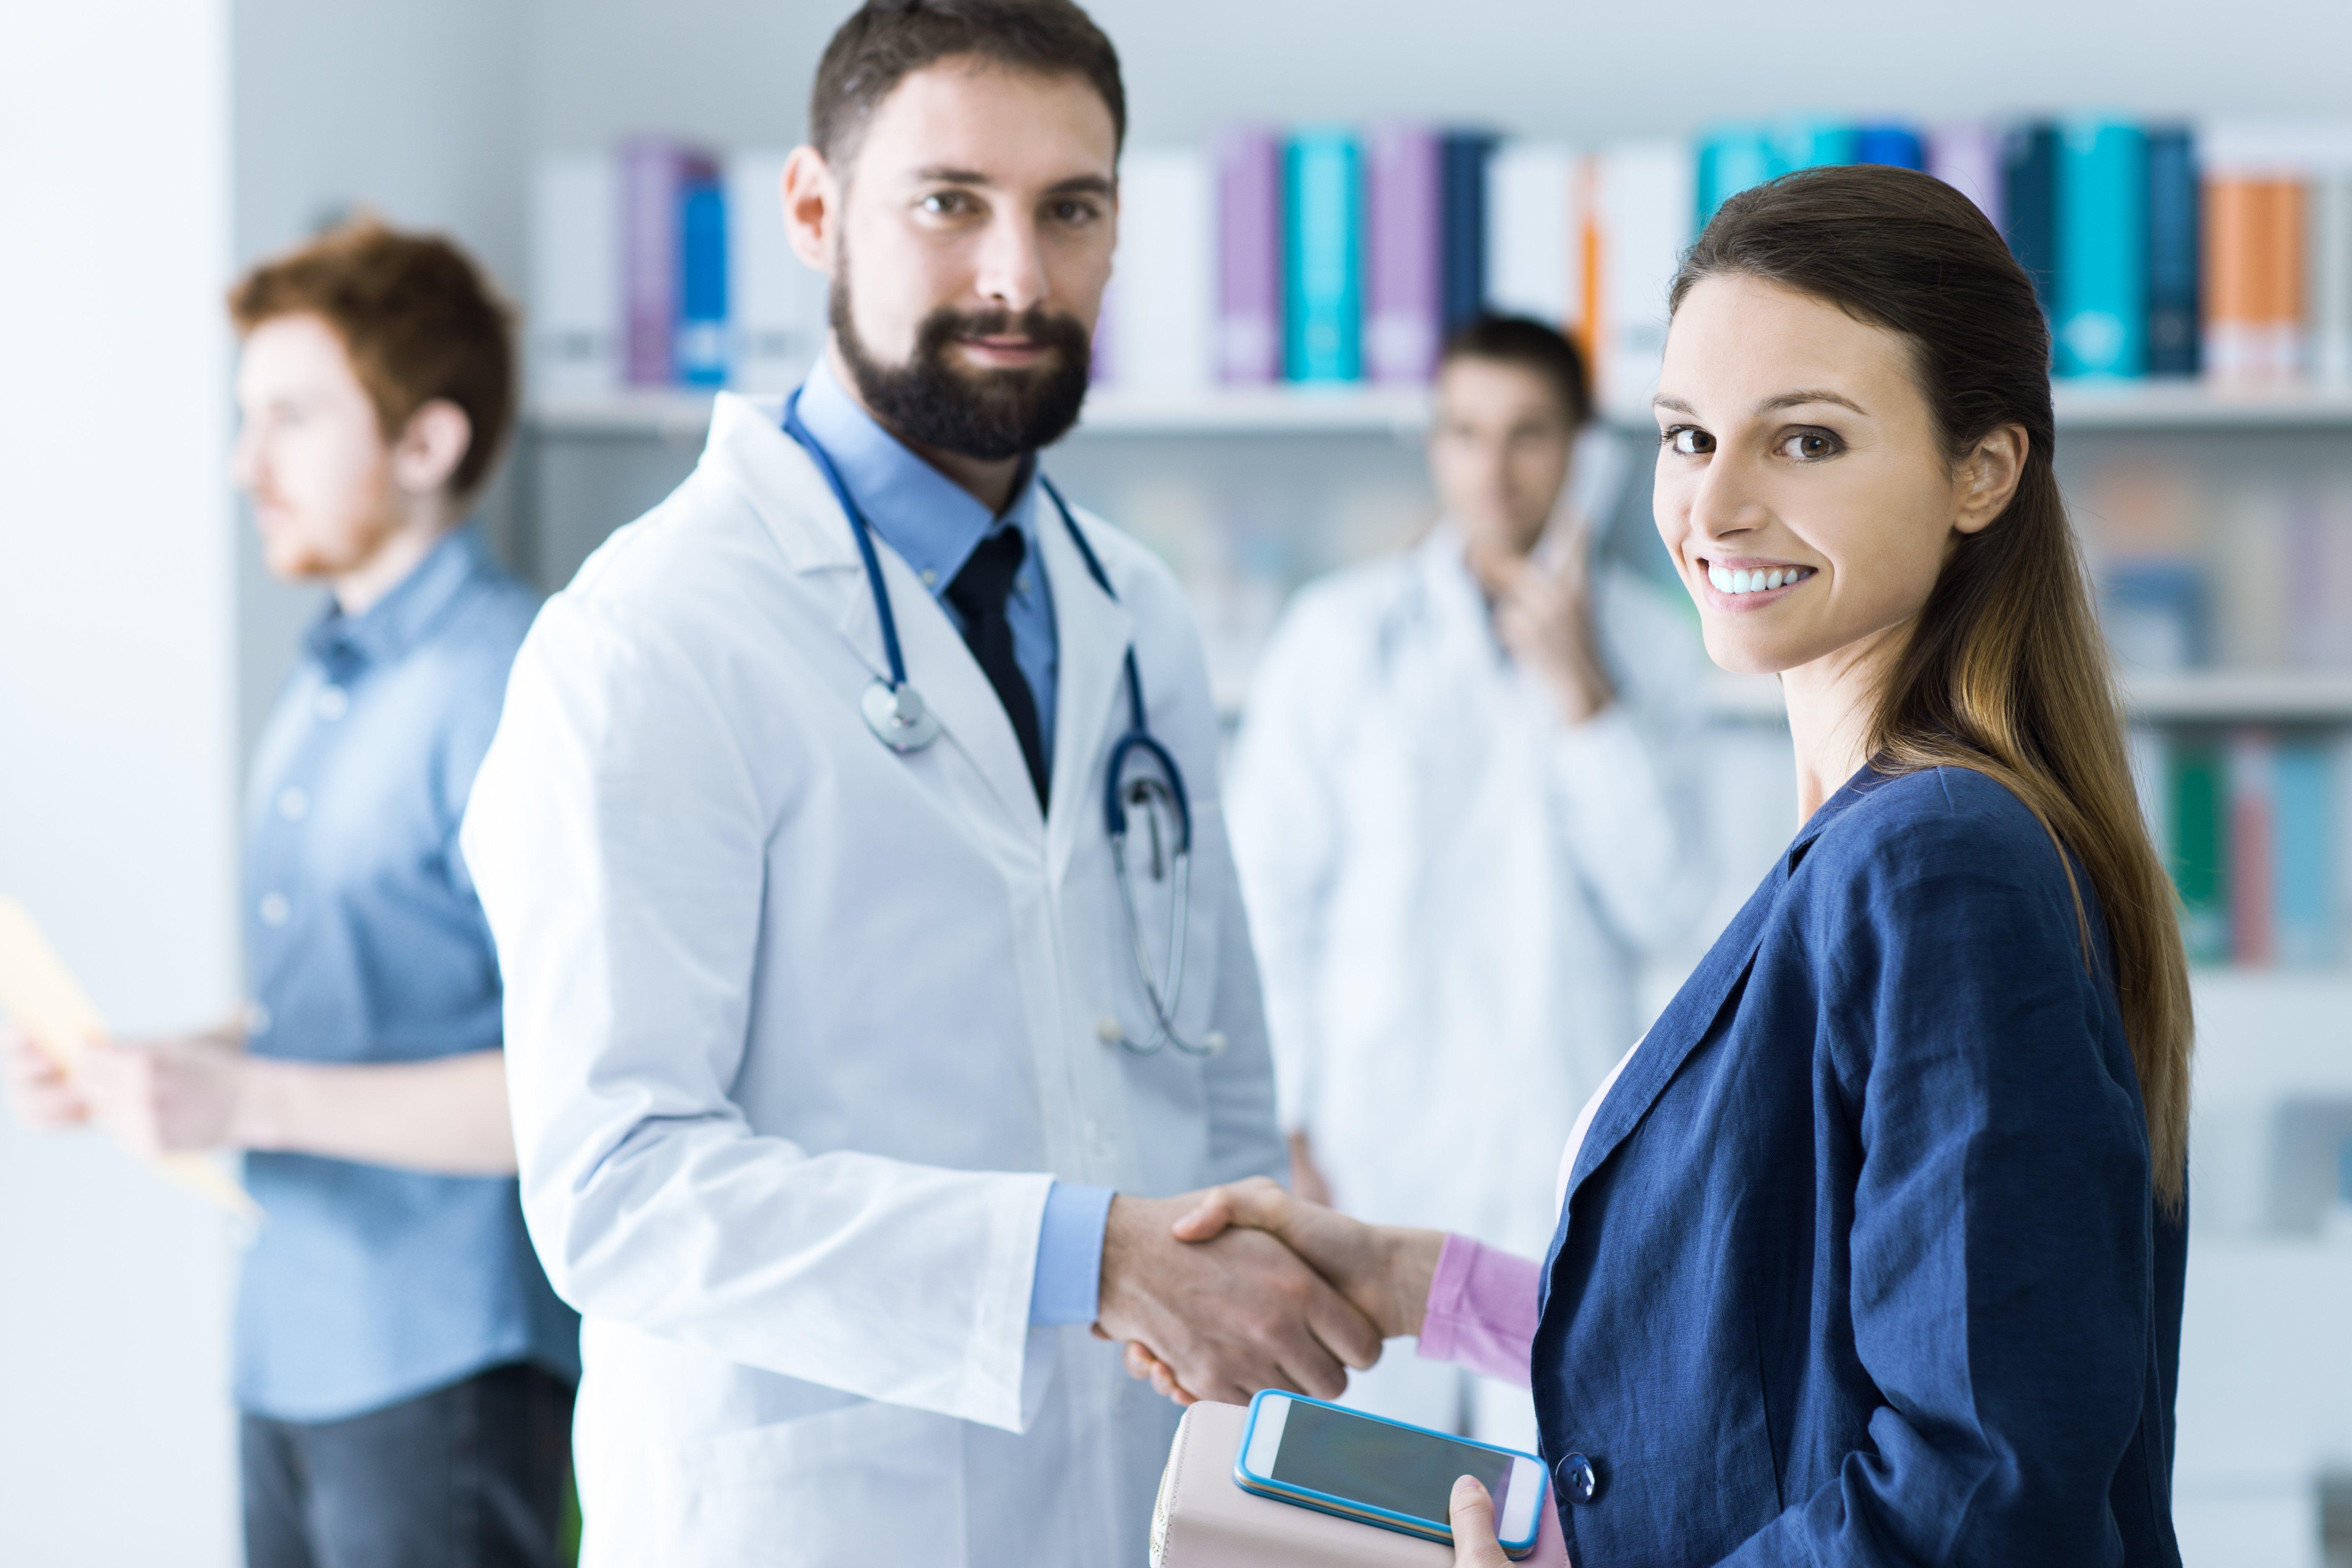 Reducing Hospital Readmission Rates Through Cultural Awareness